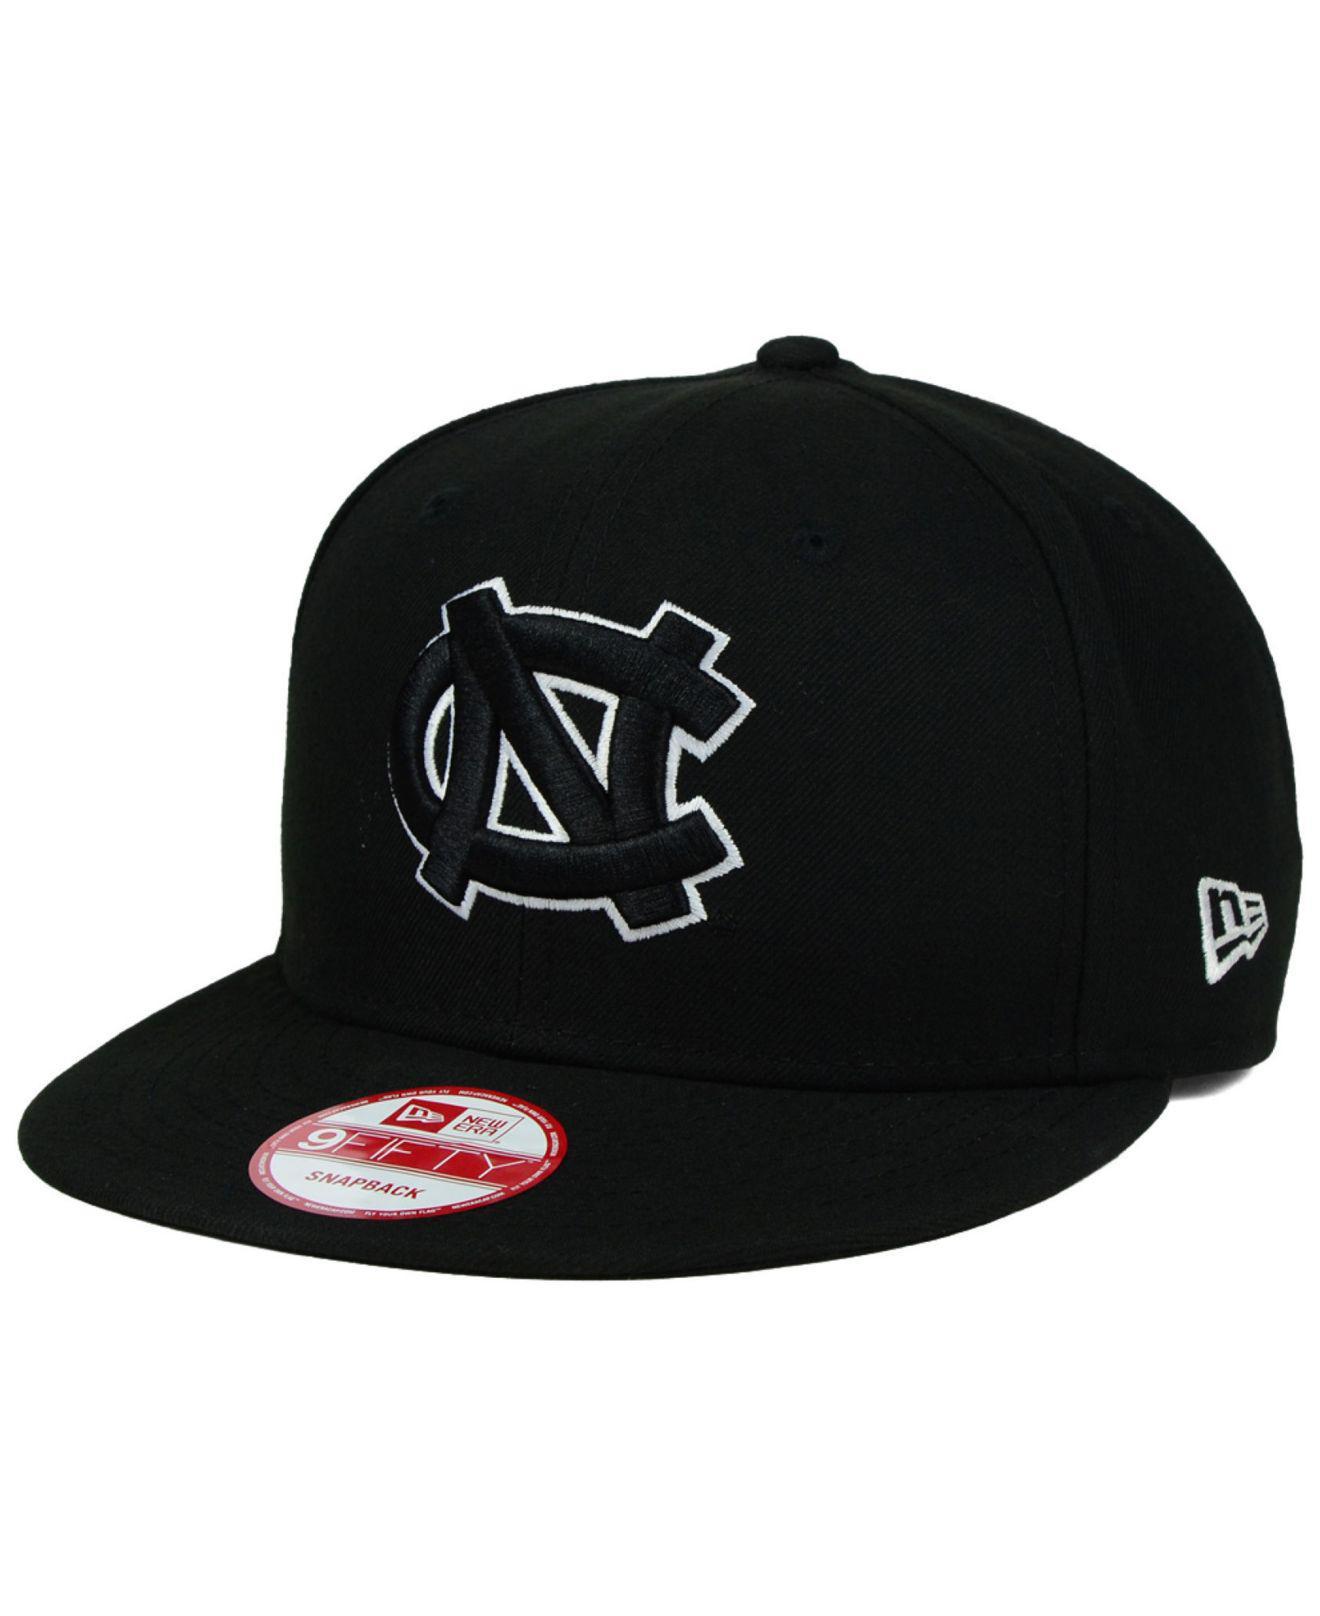 Lyst - KTZ North Carolina Tar Heels Black White 9fifty Snapback Cap ... ebe716e1c